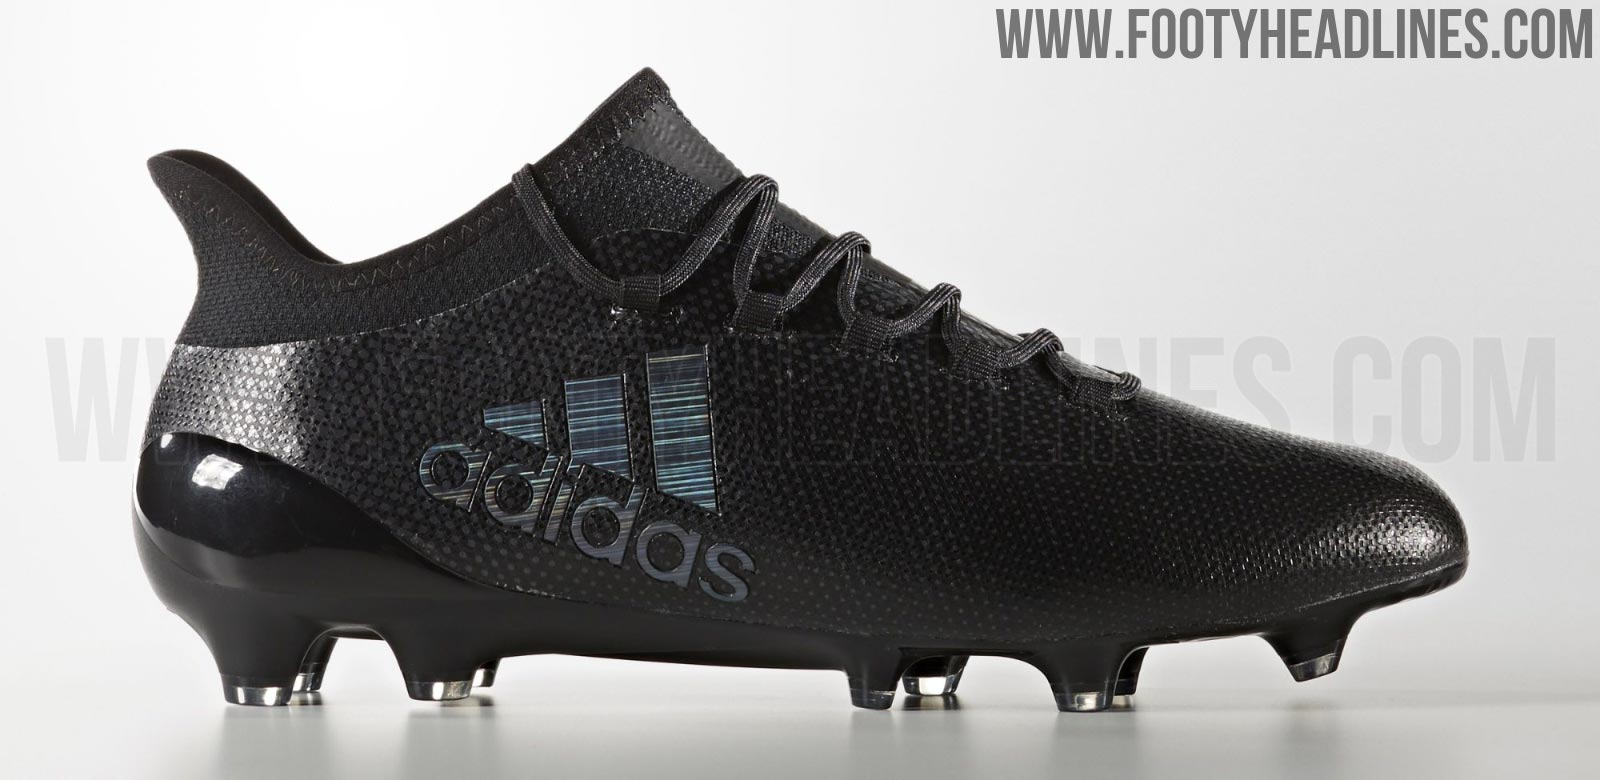 adidas x17 boots